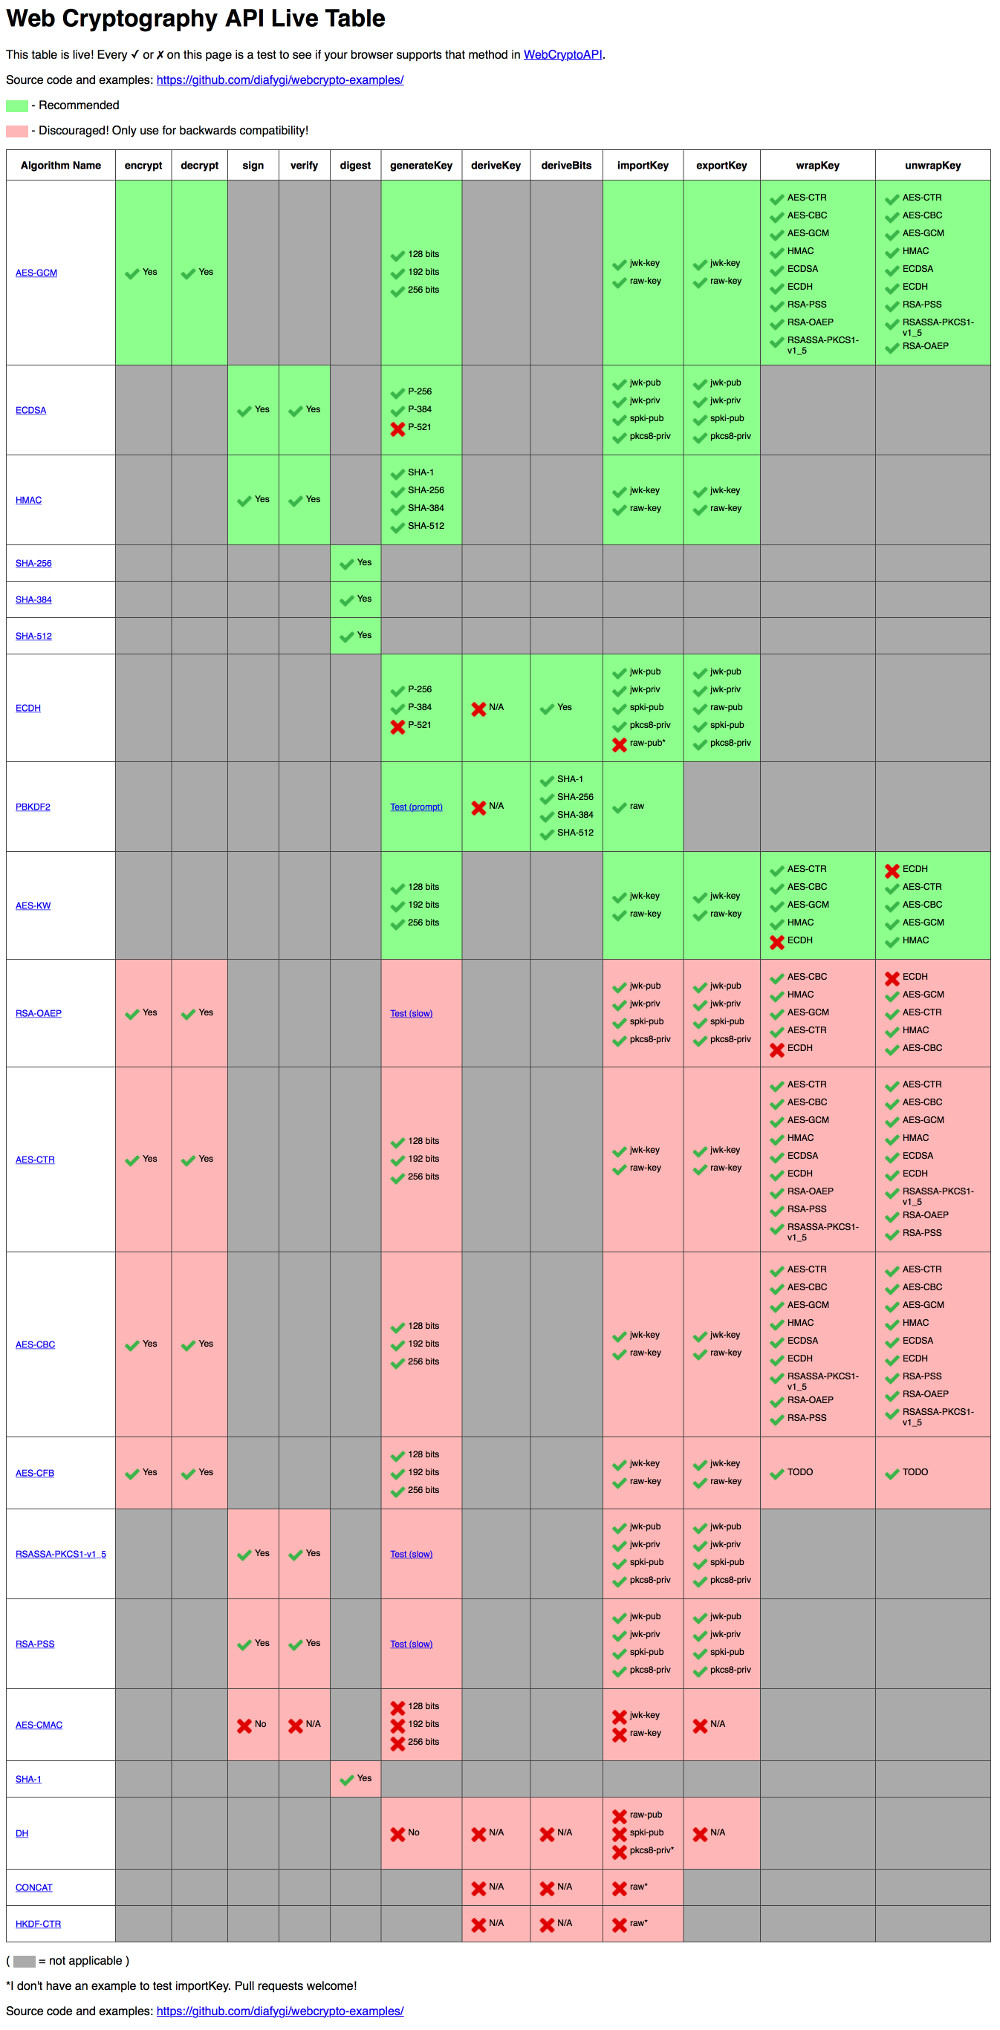 webcryptoapi live table